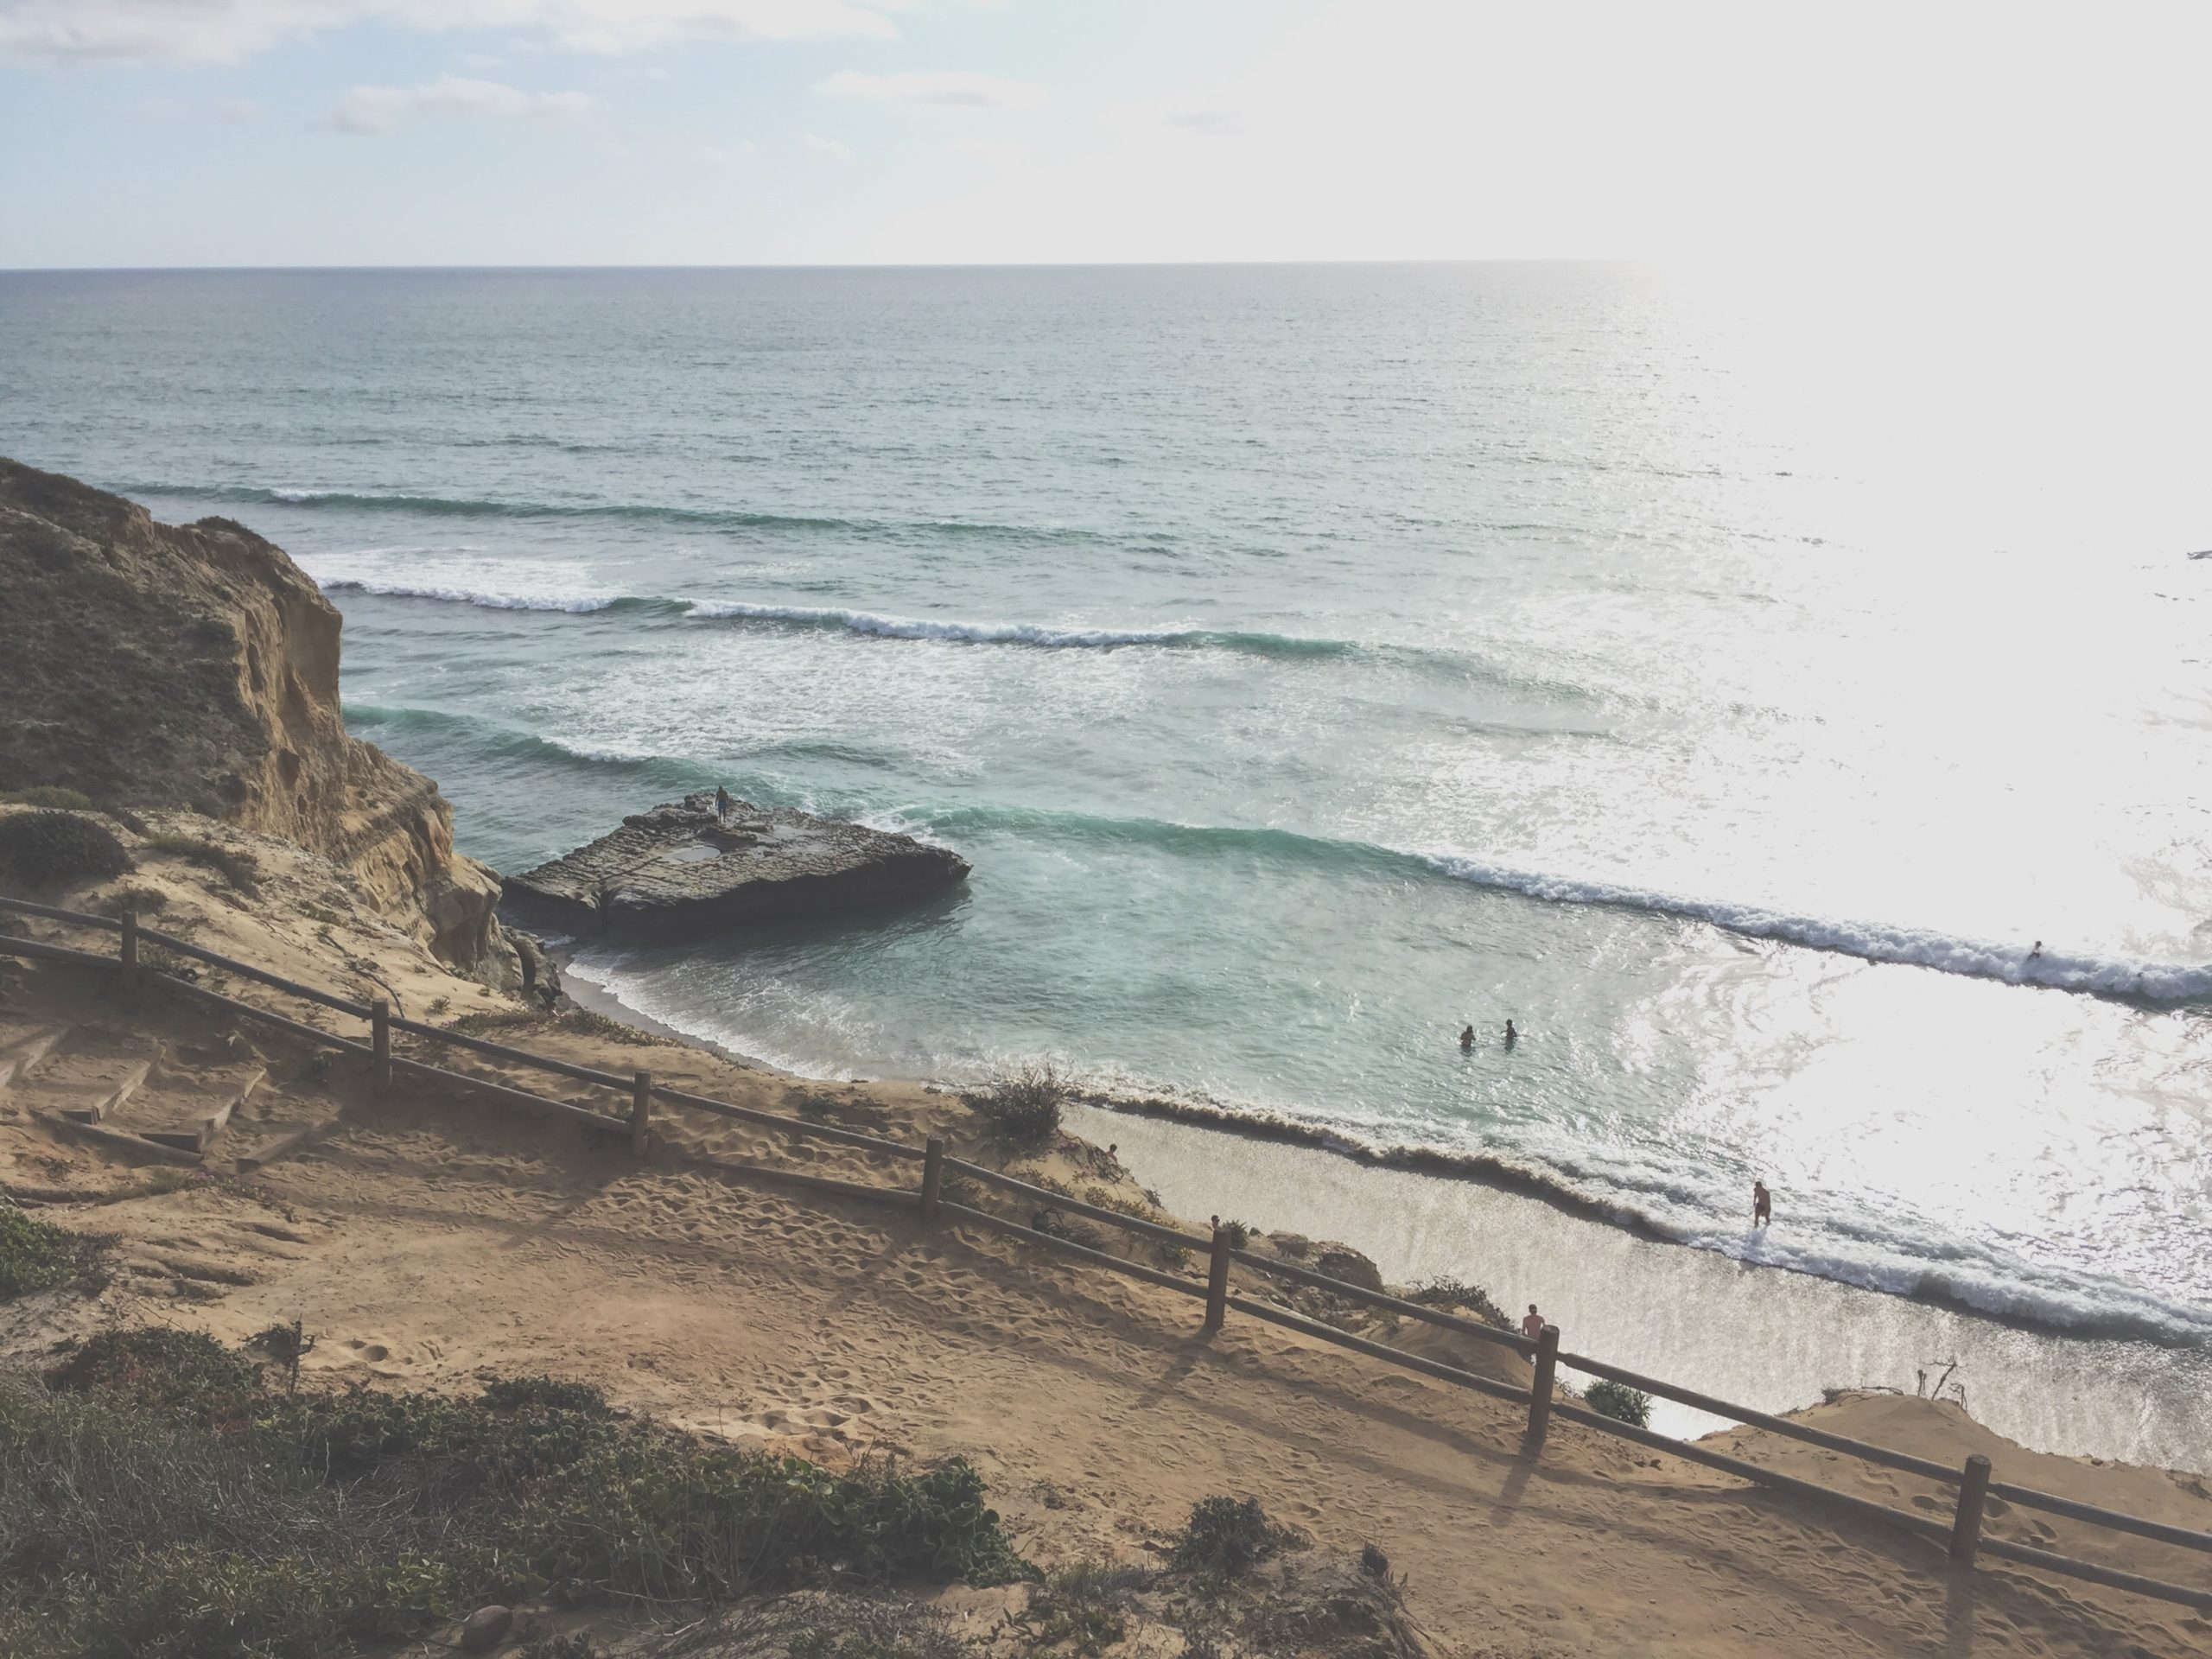 coastline in san diego california, US